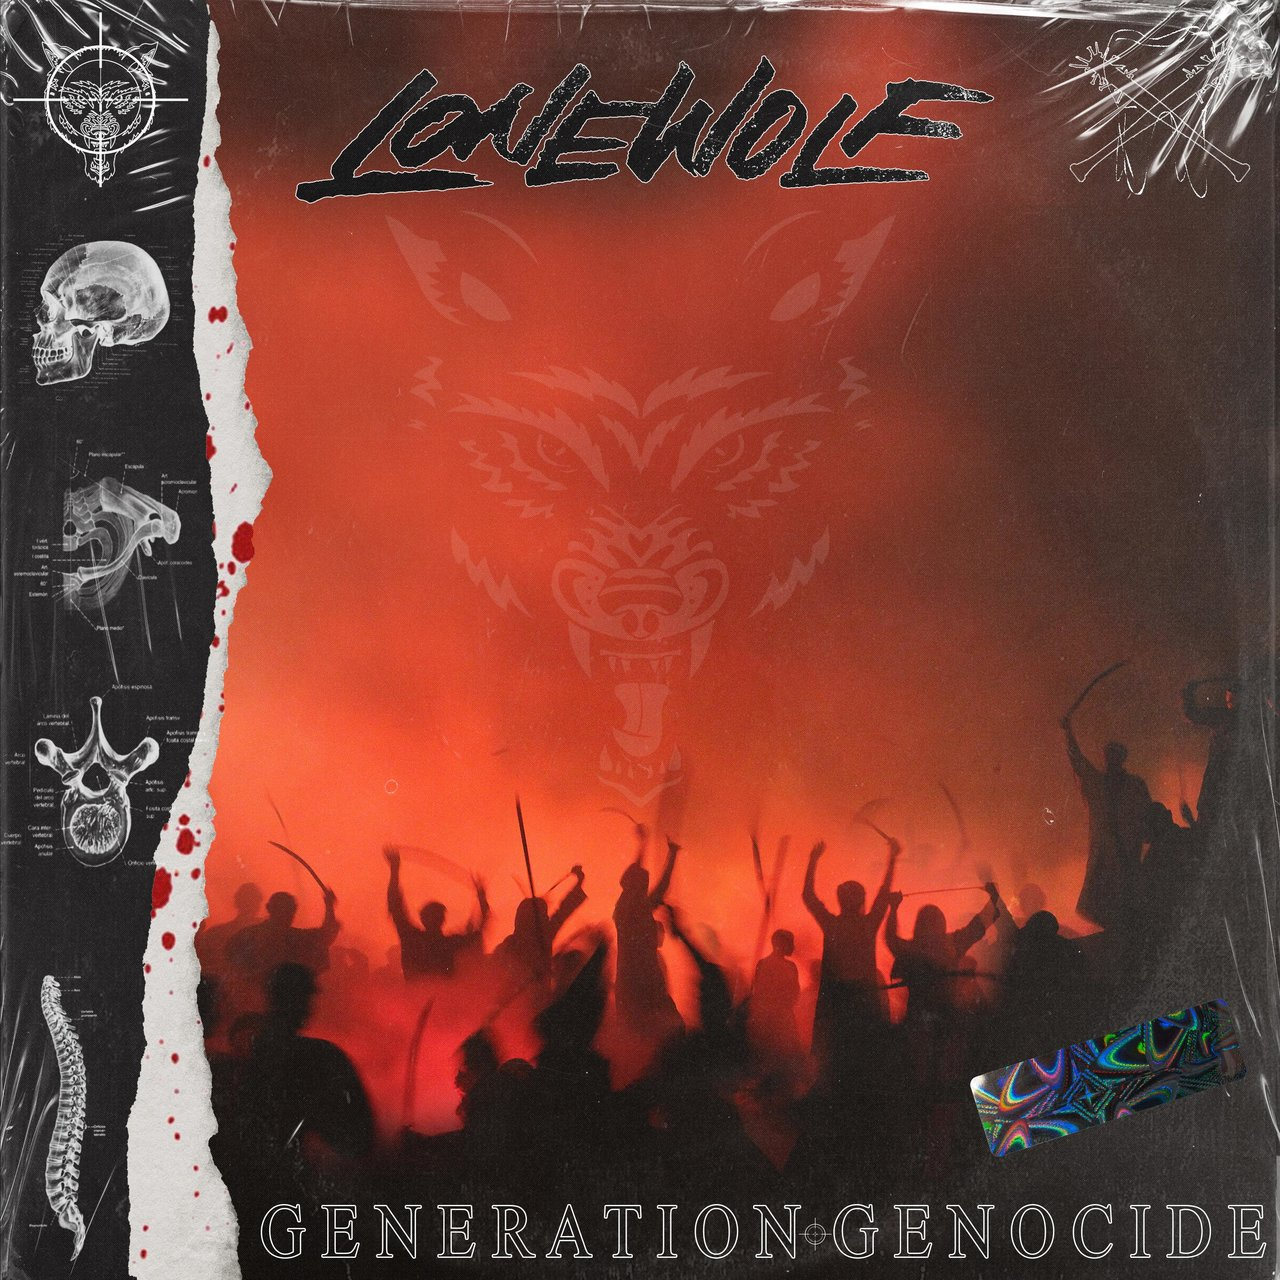 Lonewolf - Generation Genocide [single] (2021)